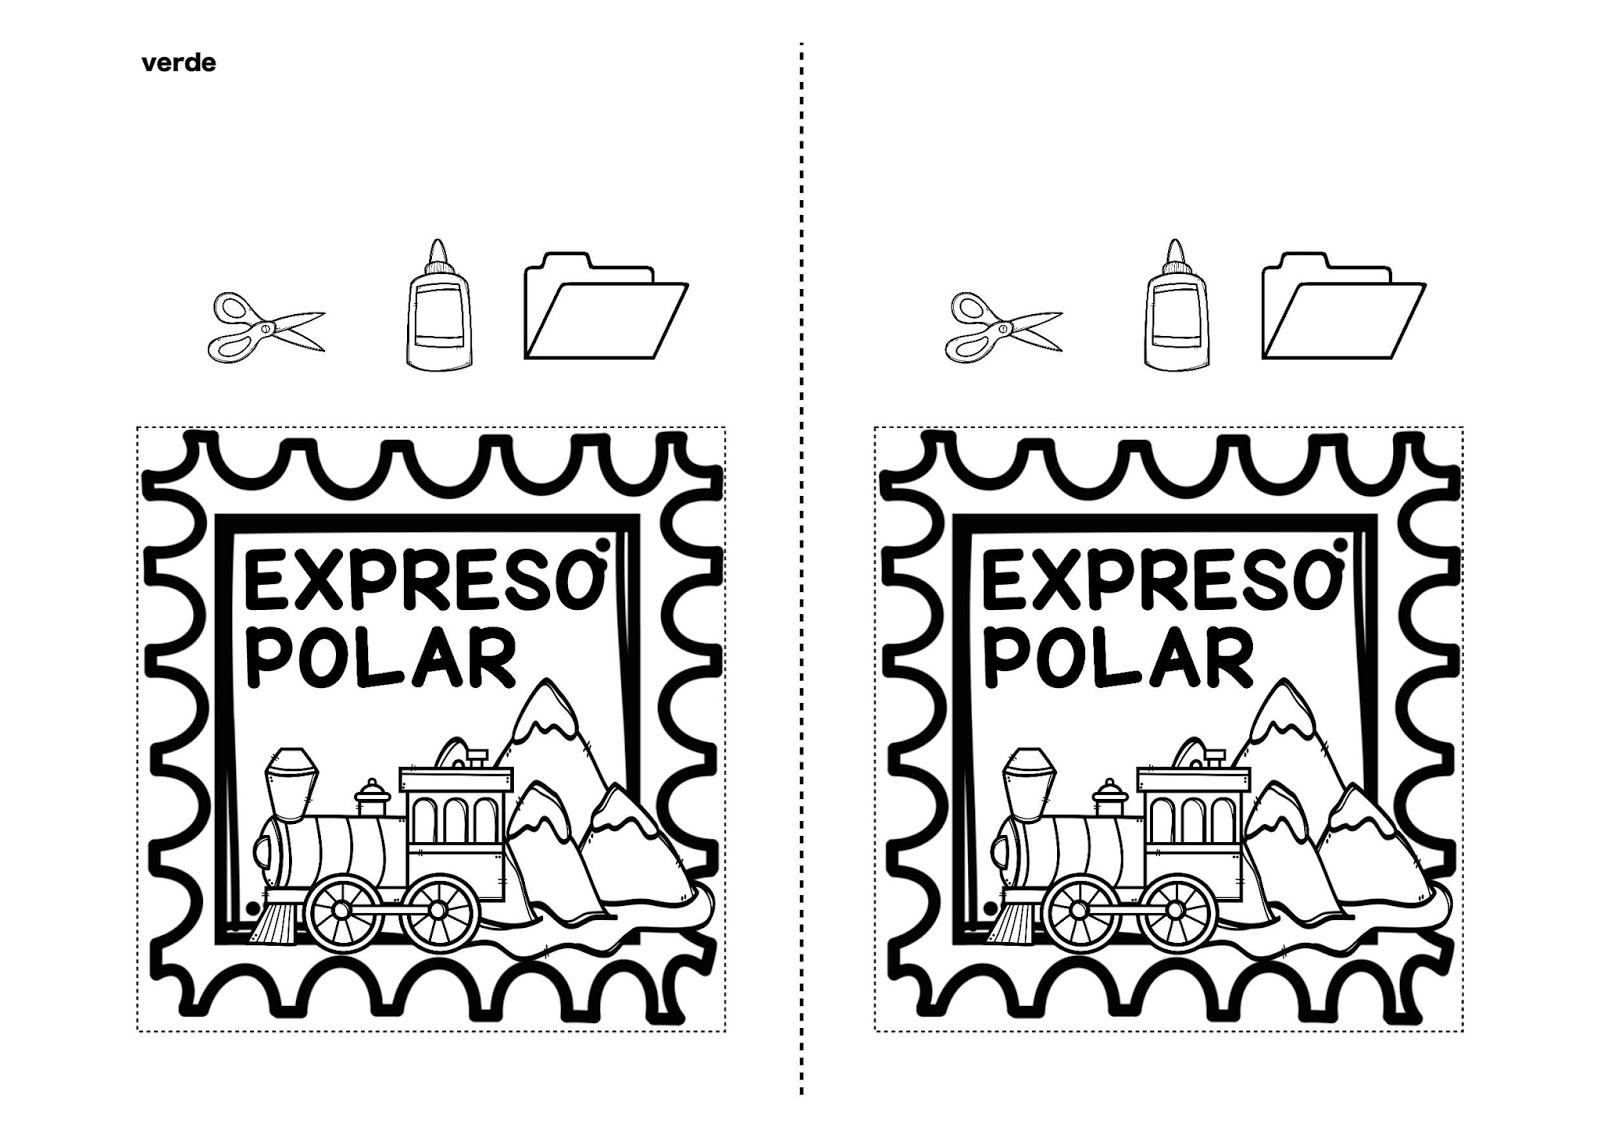 Bonito Tren Expreso Polar Para Colorear Colección de Imágenes ...